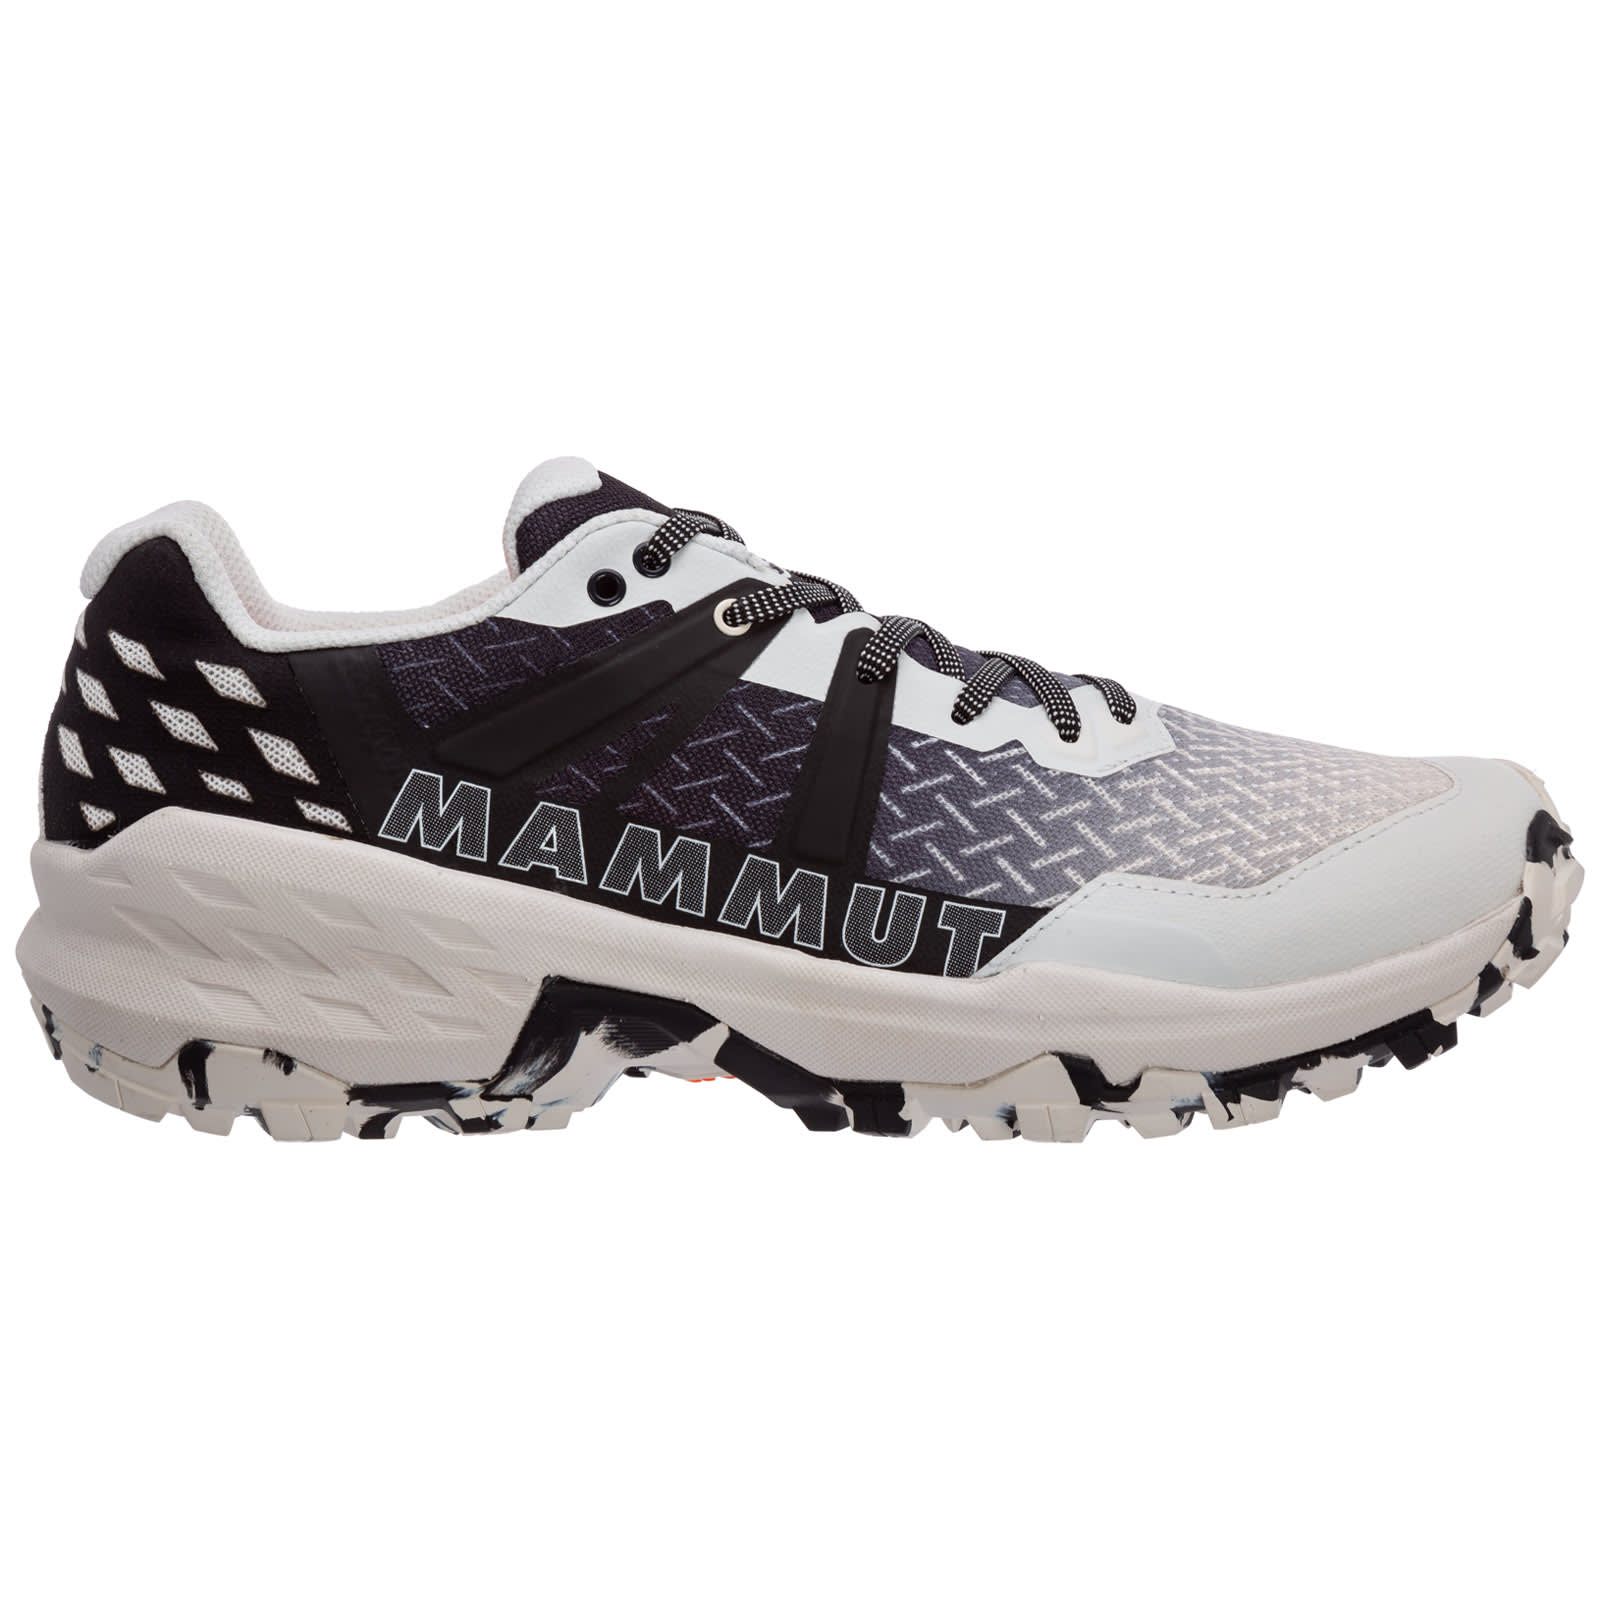 Sertig Ii Running Shoes